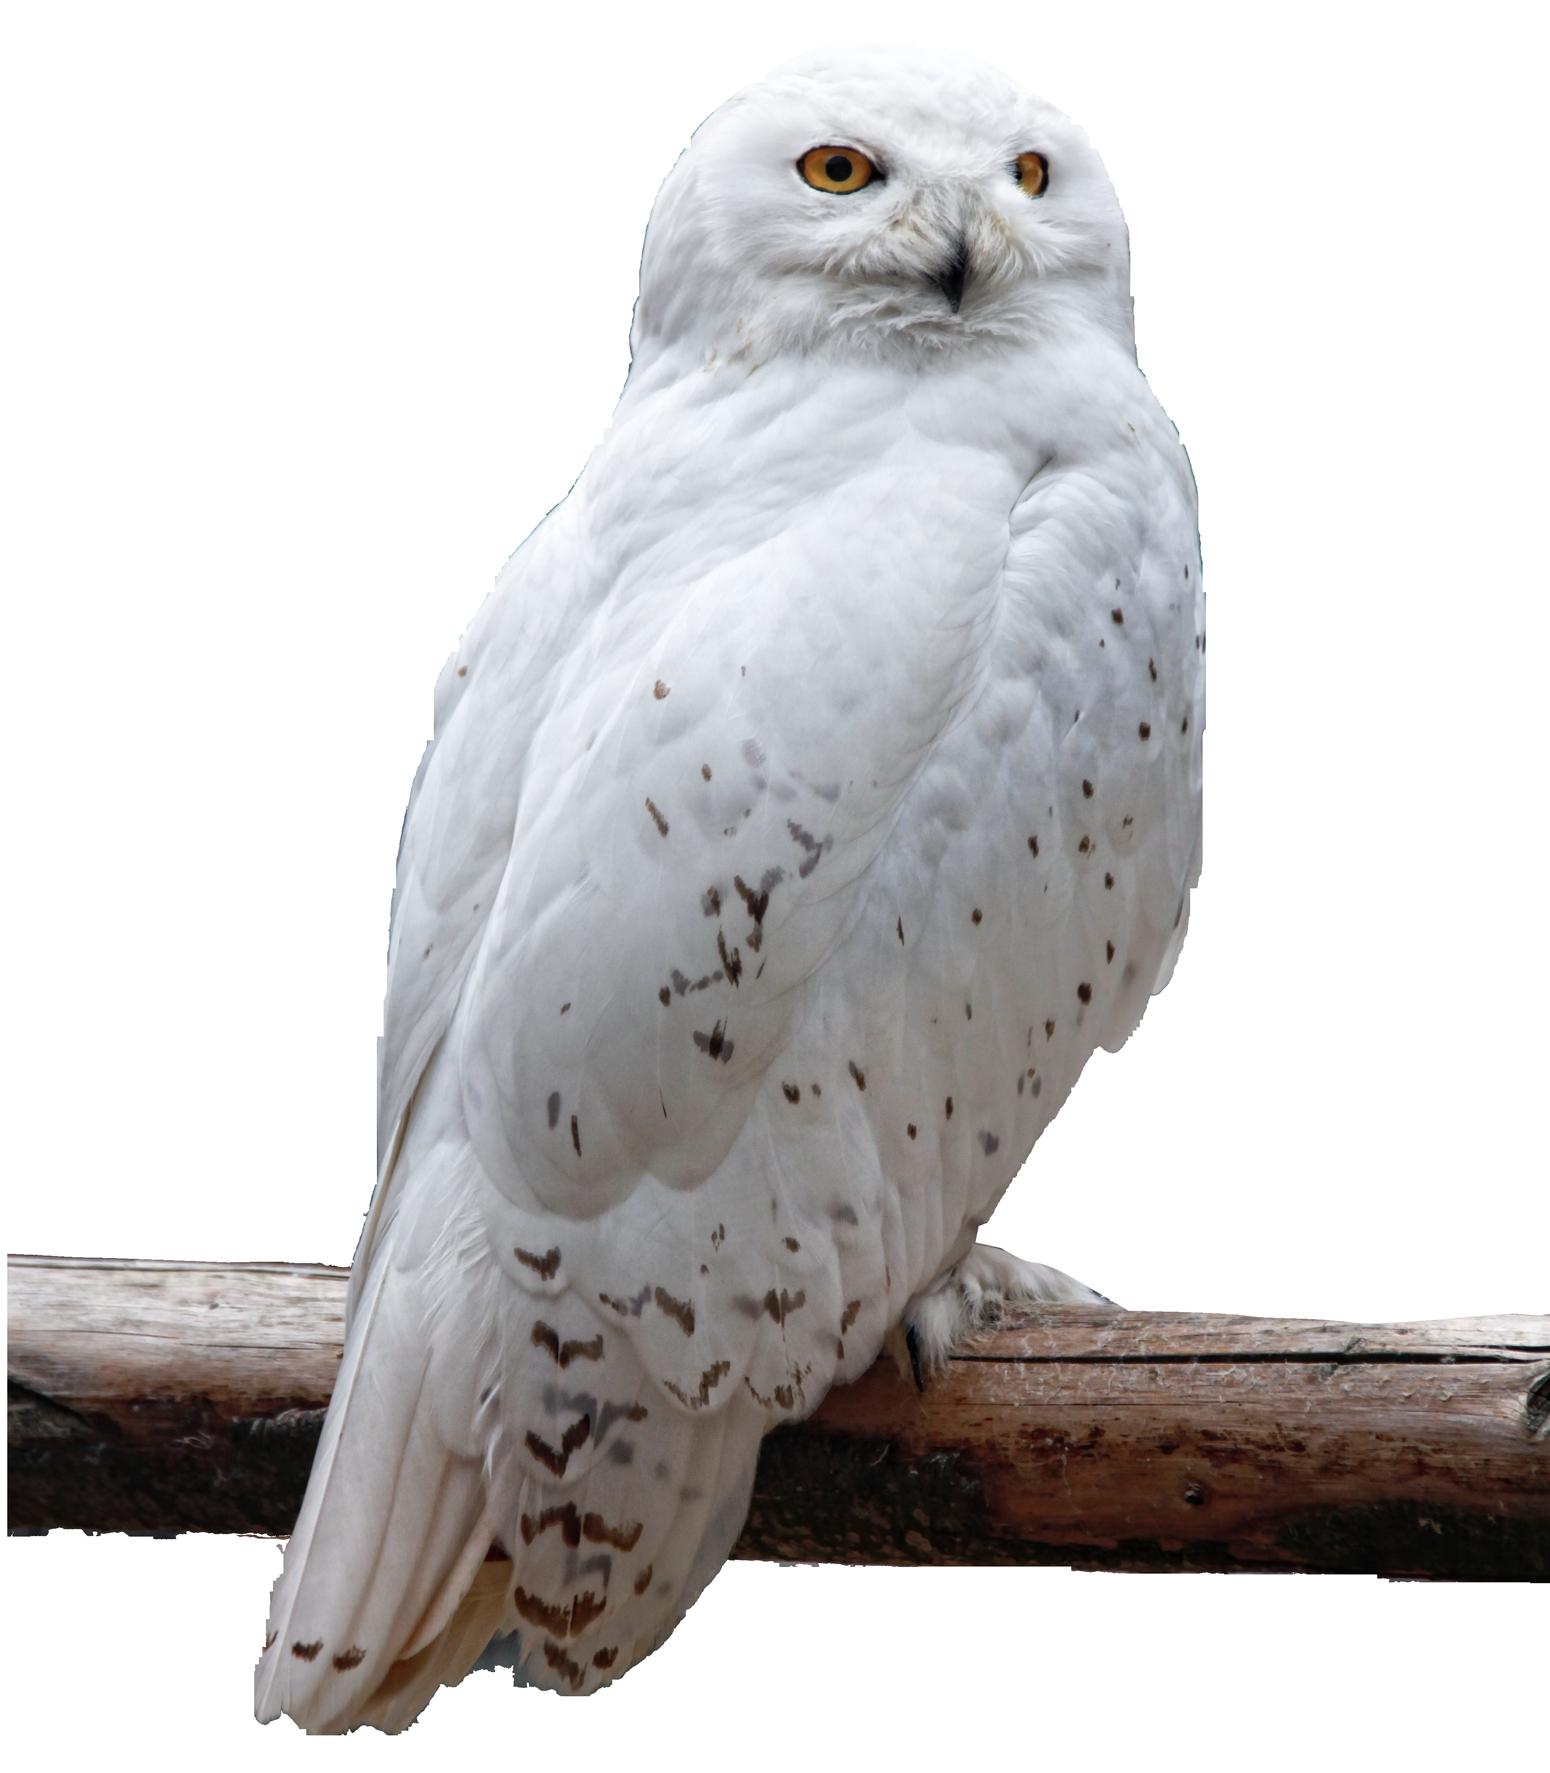 Owl PNG Image - PurePNG   Free transparent CC0 PNG Image ...